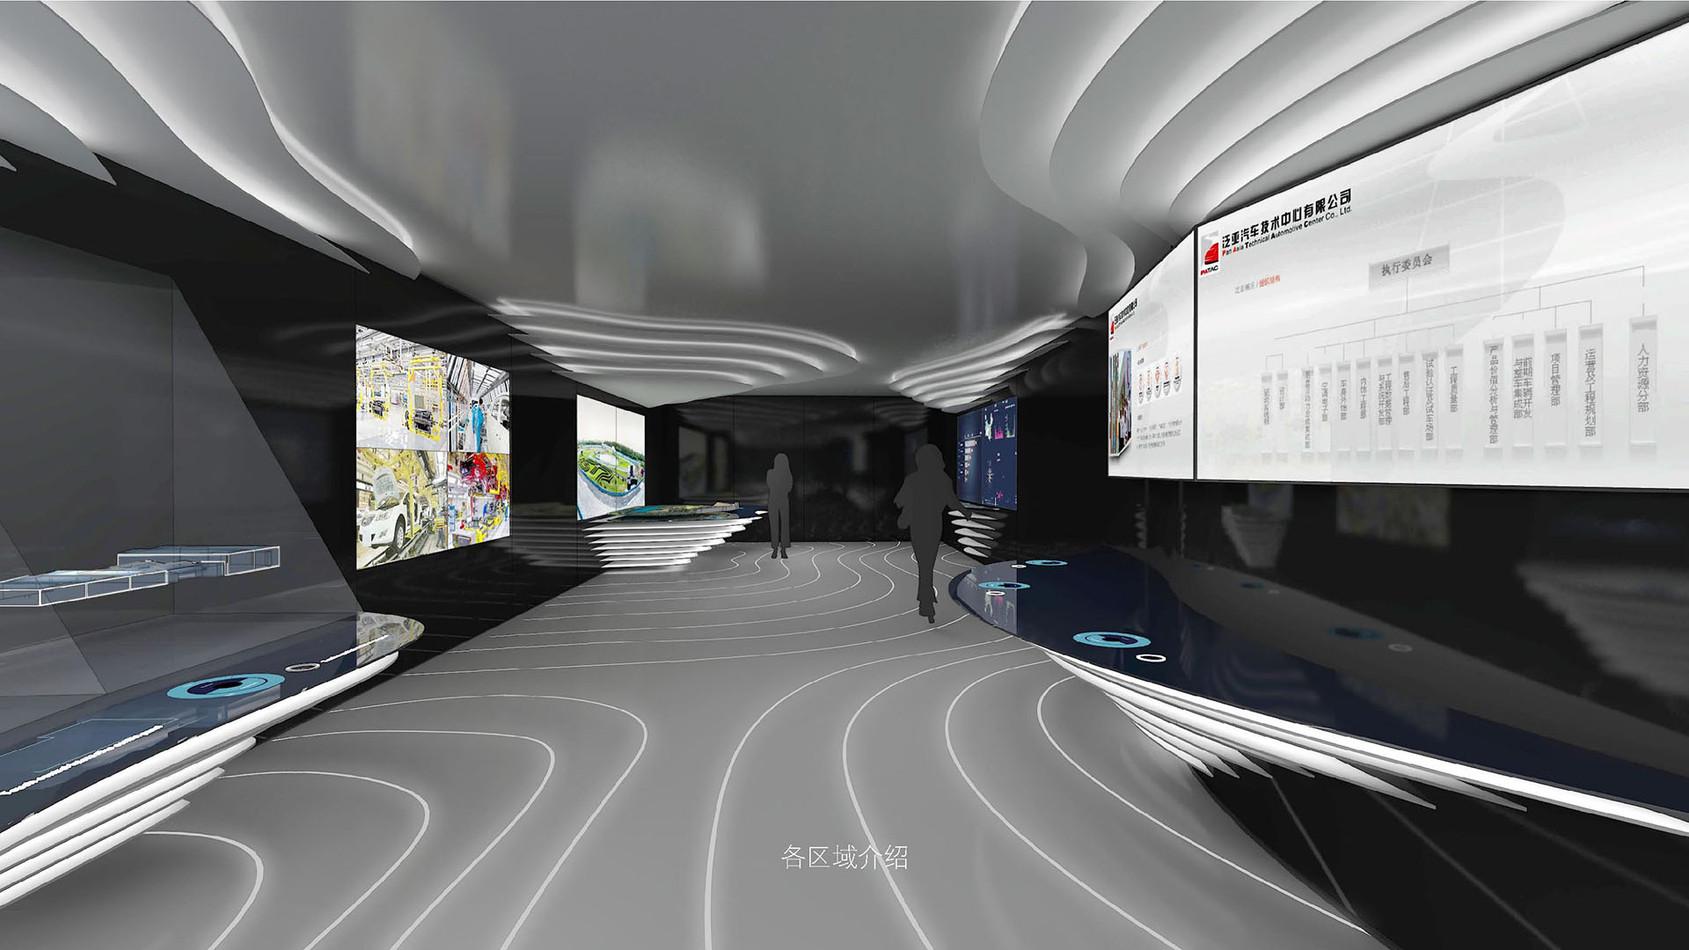 SGM-CORPORATE-MUSEUM-ZH 14.jpg